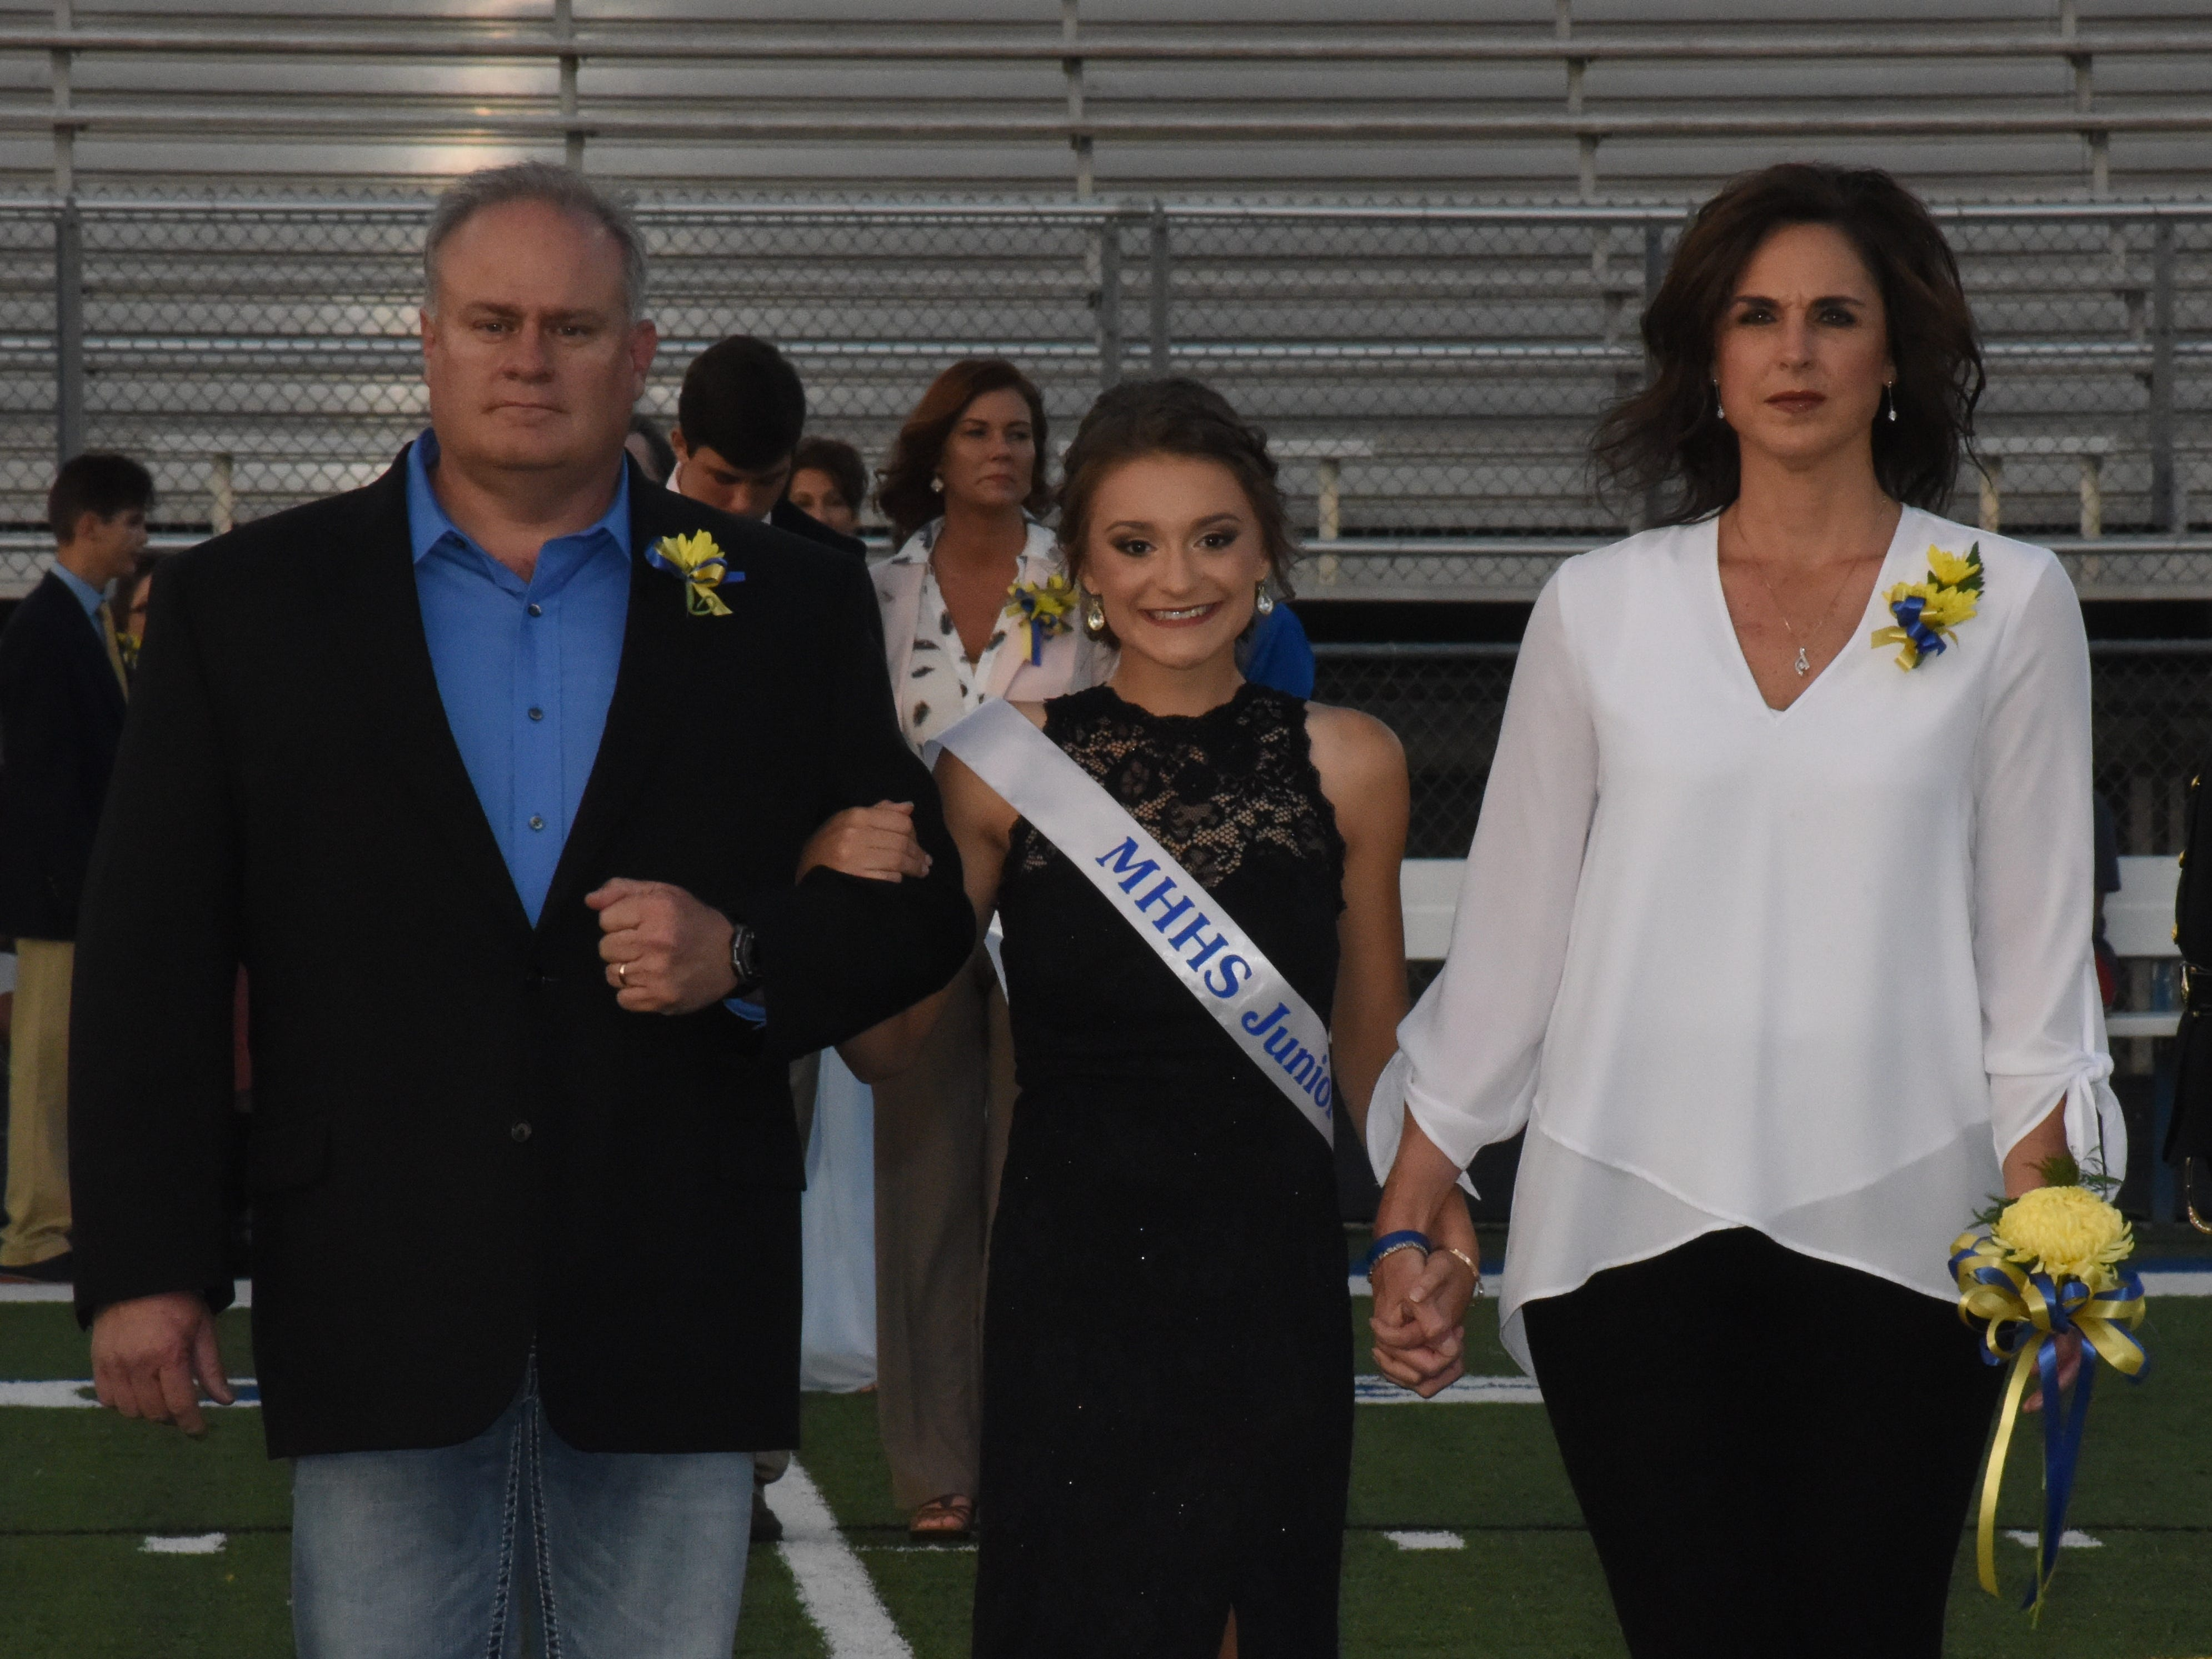 Junior maid Sydney Czanstkowski and her escorts in memory of Hayden Padgett, Brian Padgett (left) and Michelle Padgett.